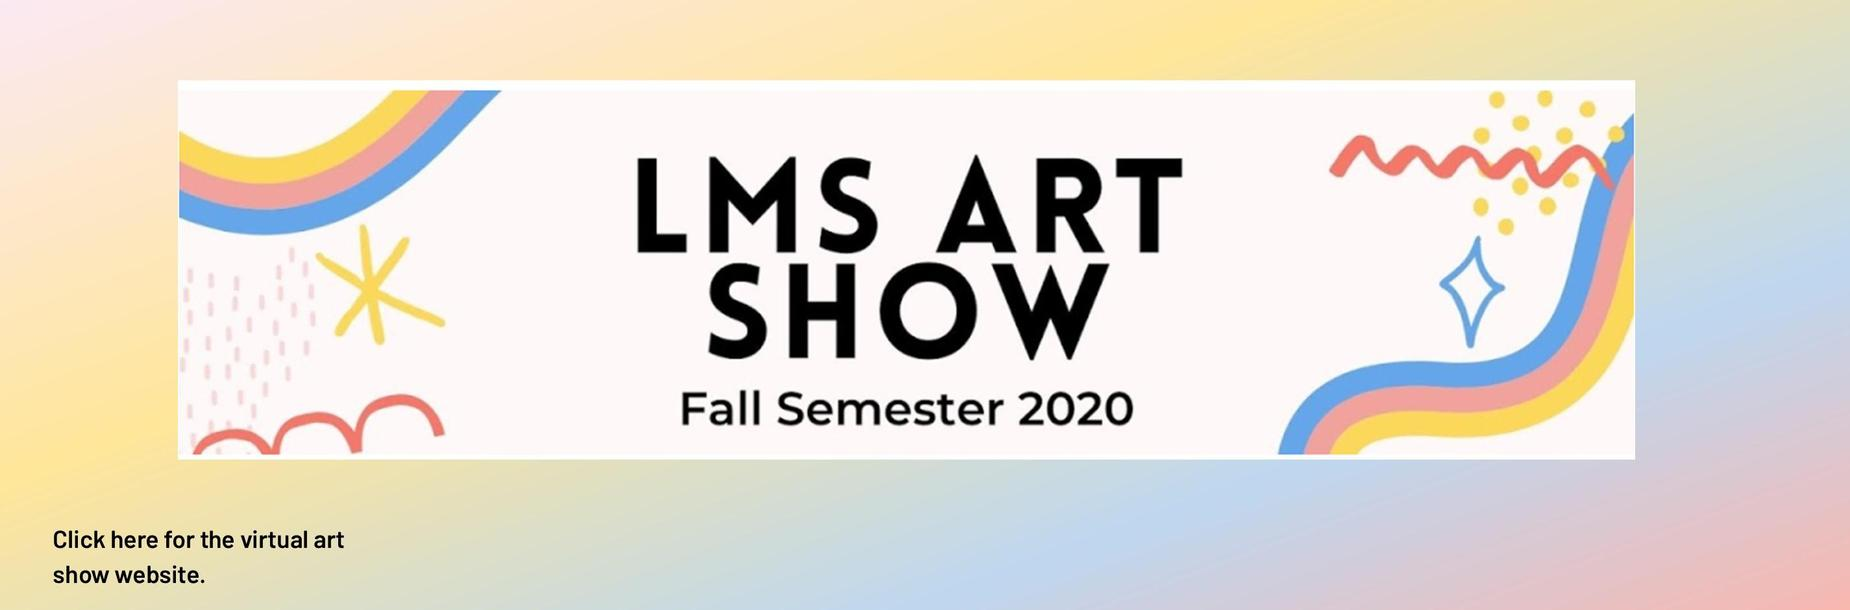 Art show website link